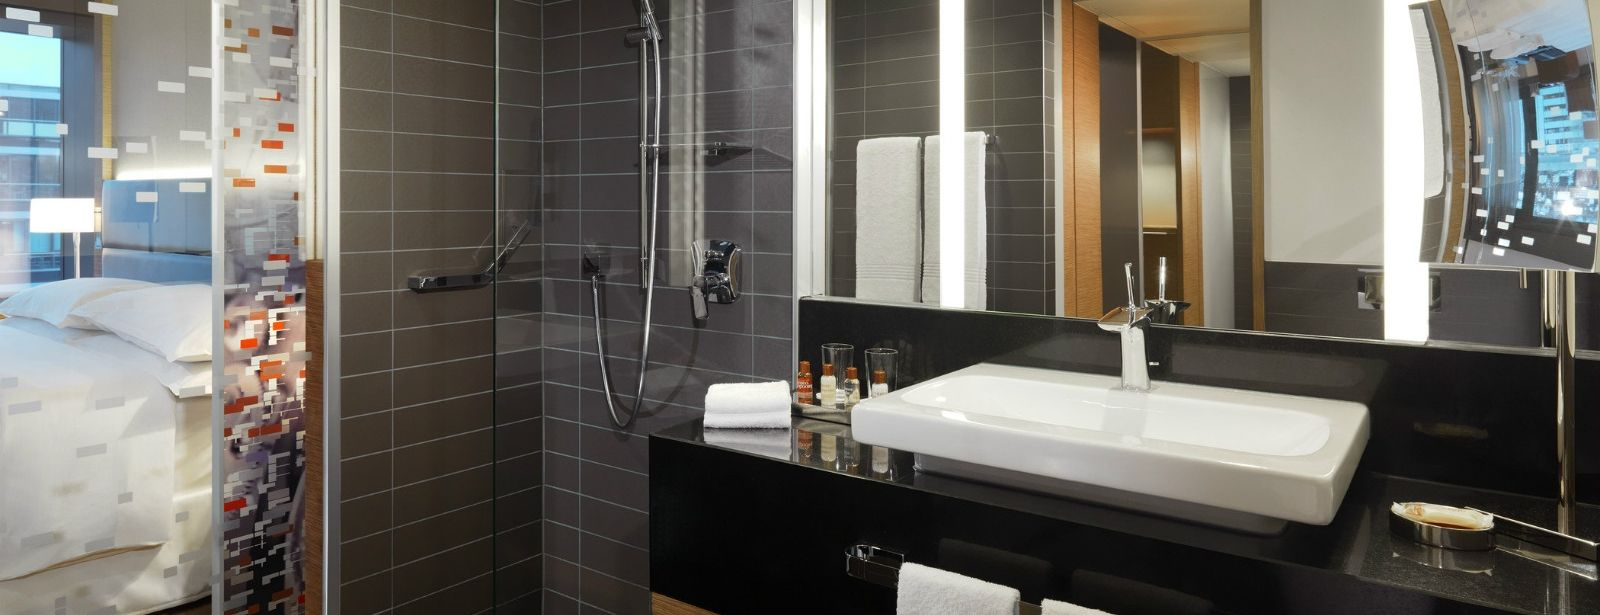 3732-Sheraton-Zurich-Hotel-Bathroom-1600x900